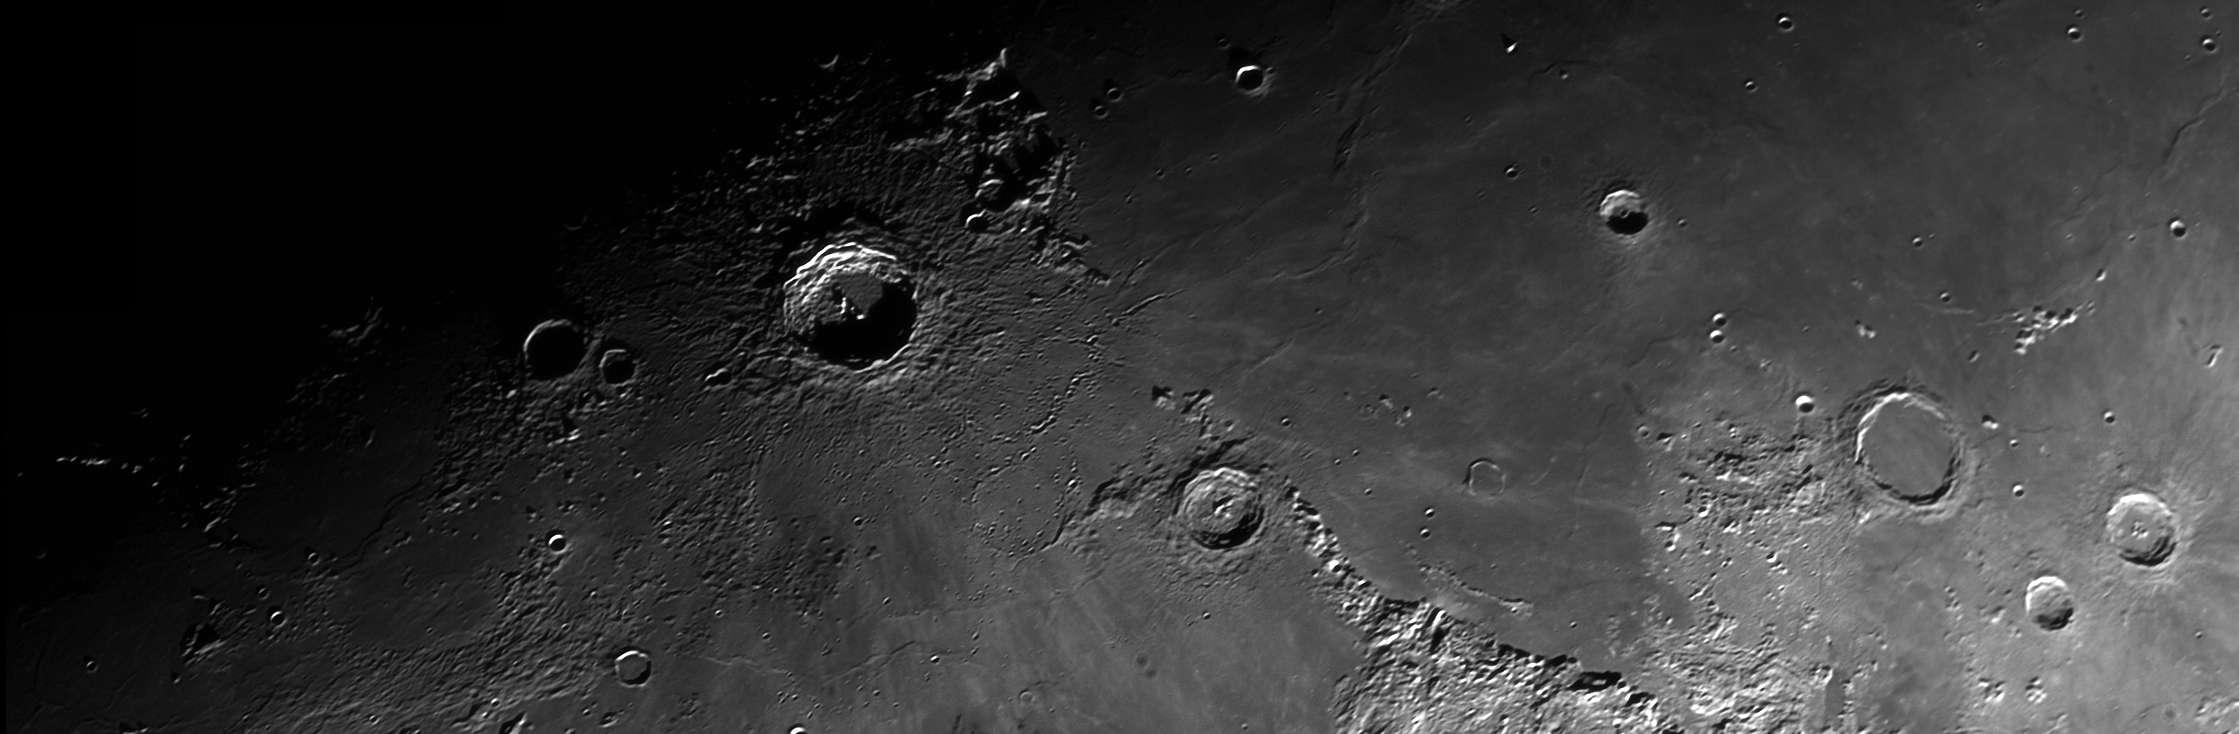 La Lune - Page 3 Panoma16